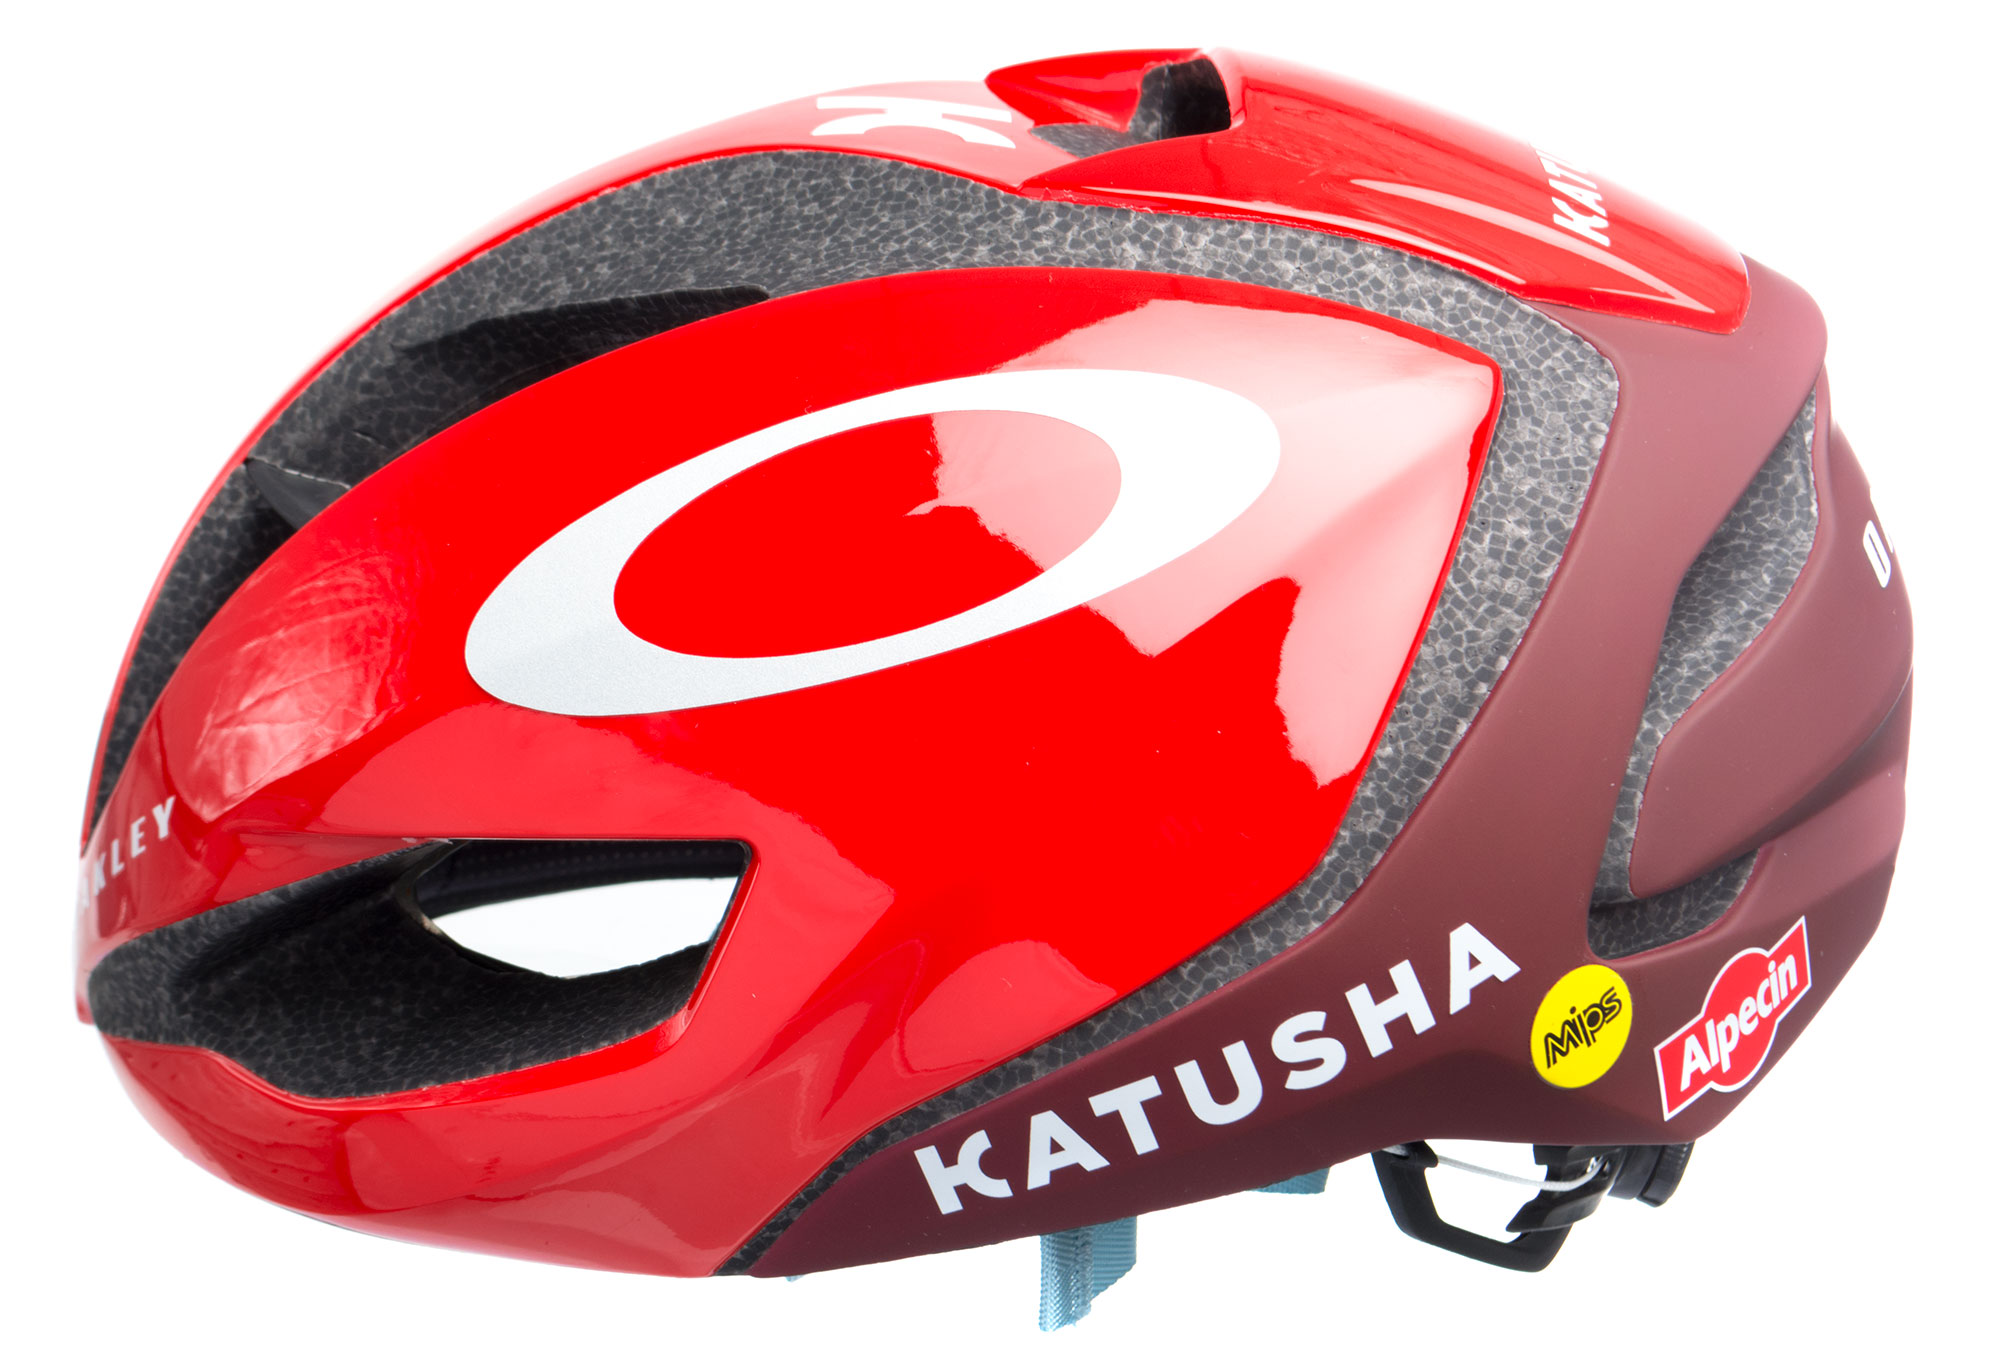 f818d46889 Oakley Helmet ARO5 Mips Team Katusha Alpecin Rouge